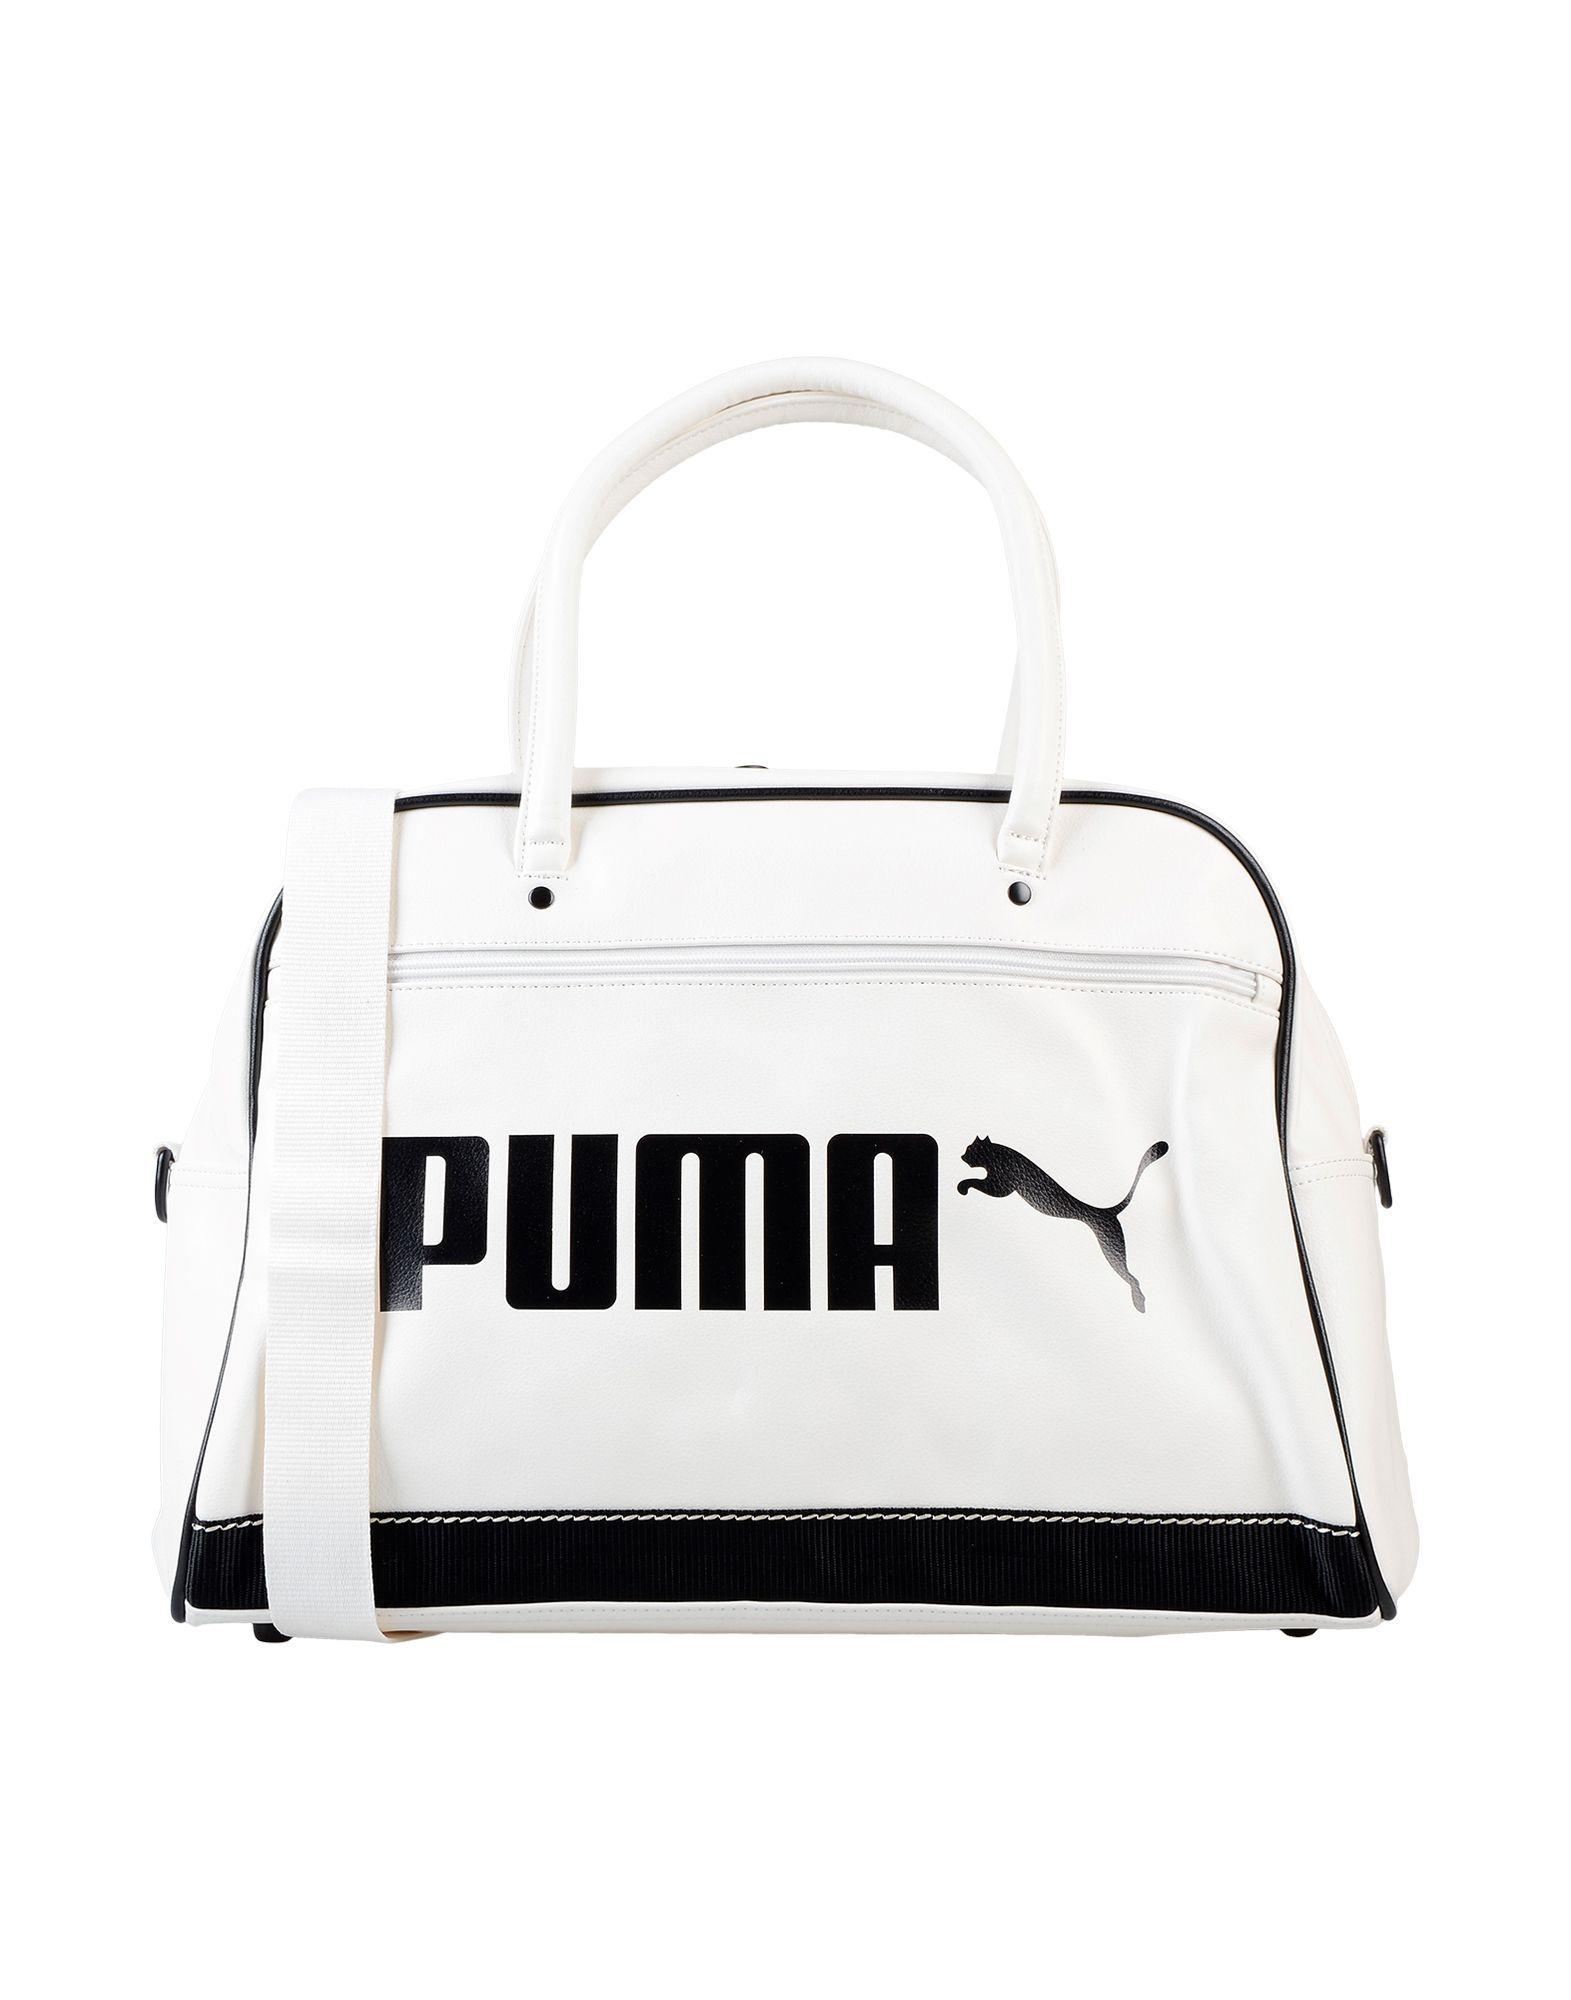 7e1f2a72ac Puma Handbag - Women Puma Handbags online on YOOX United States ...